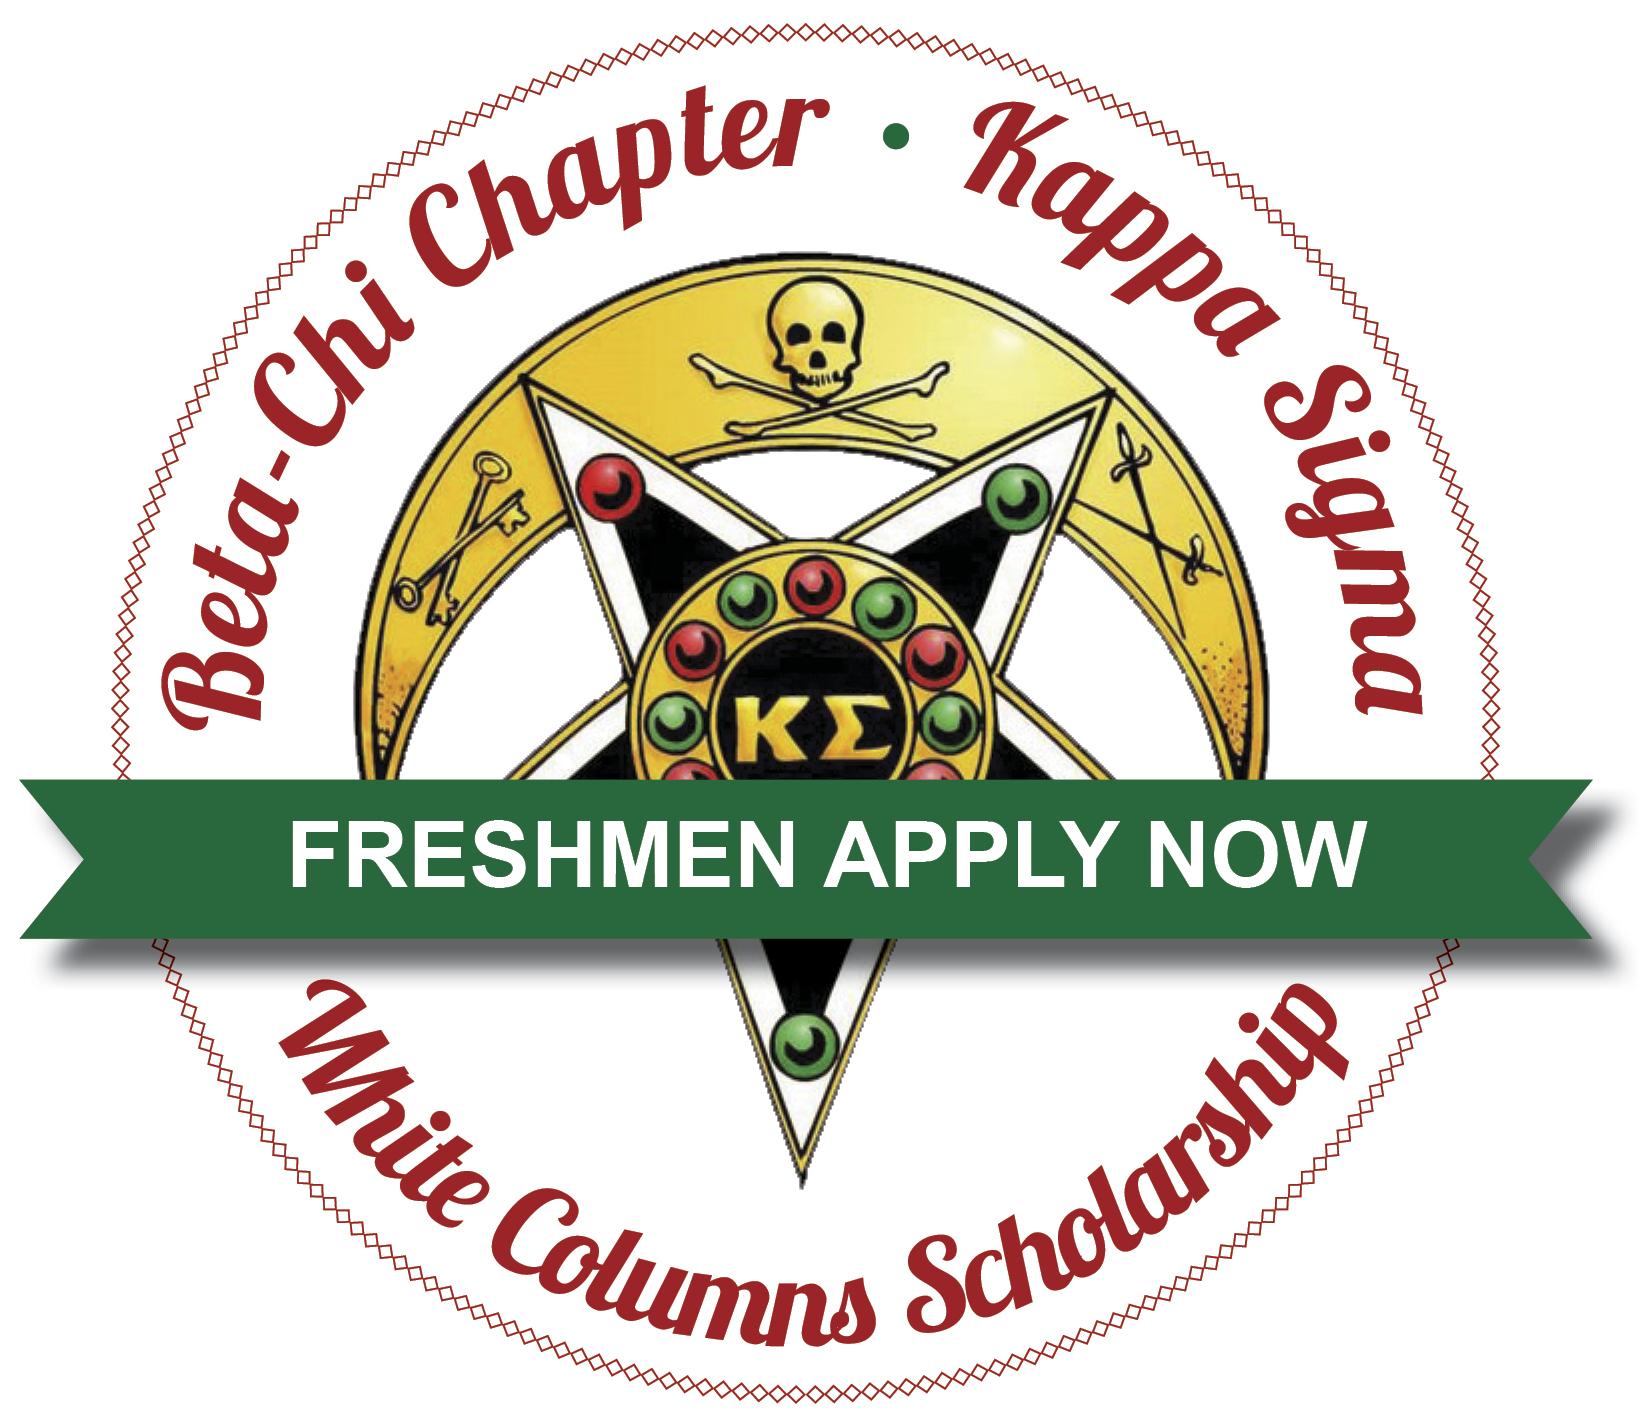 Rush Kappa Sigma